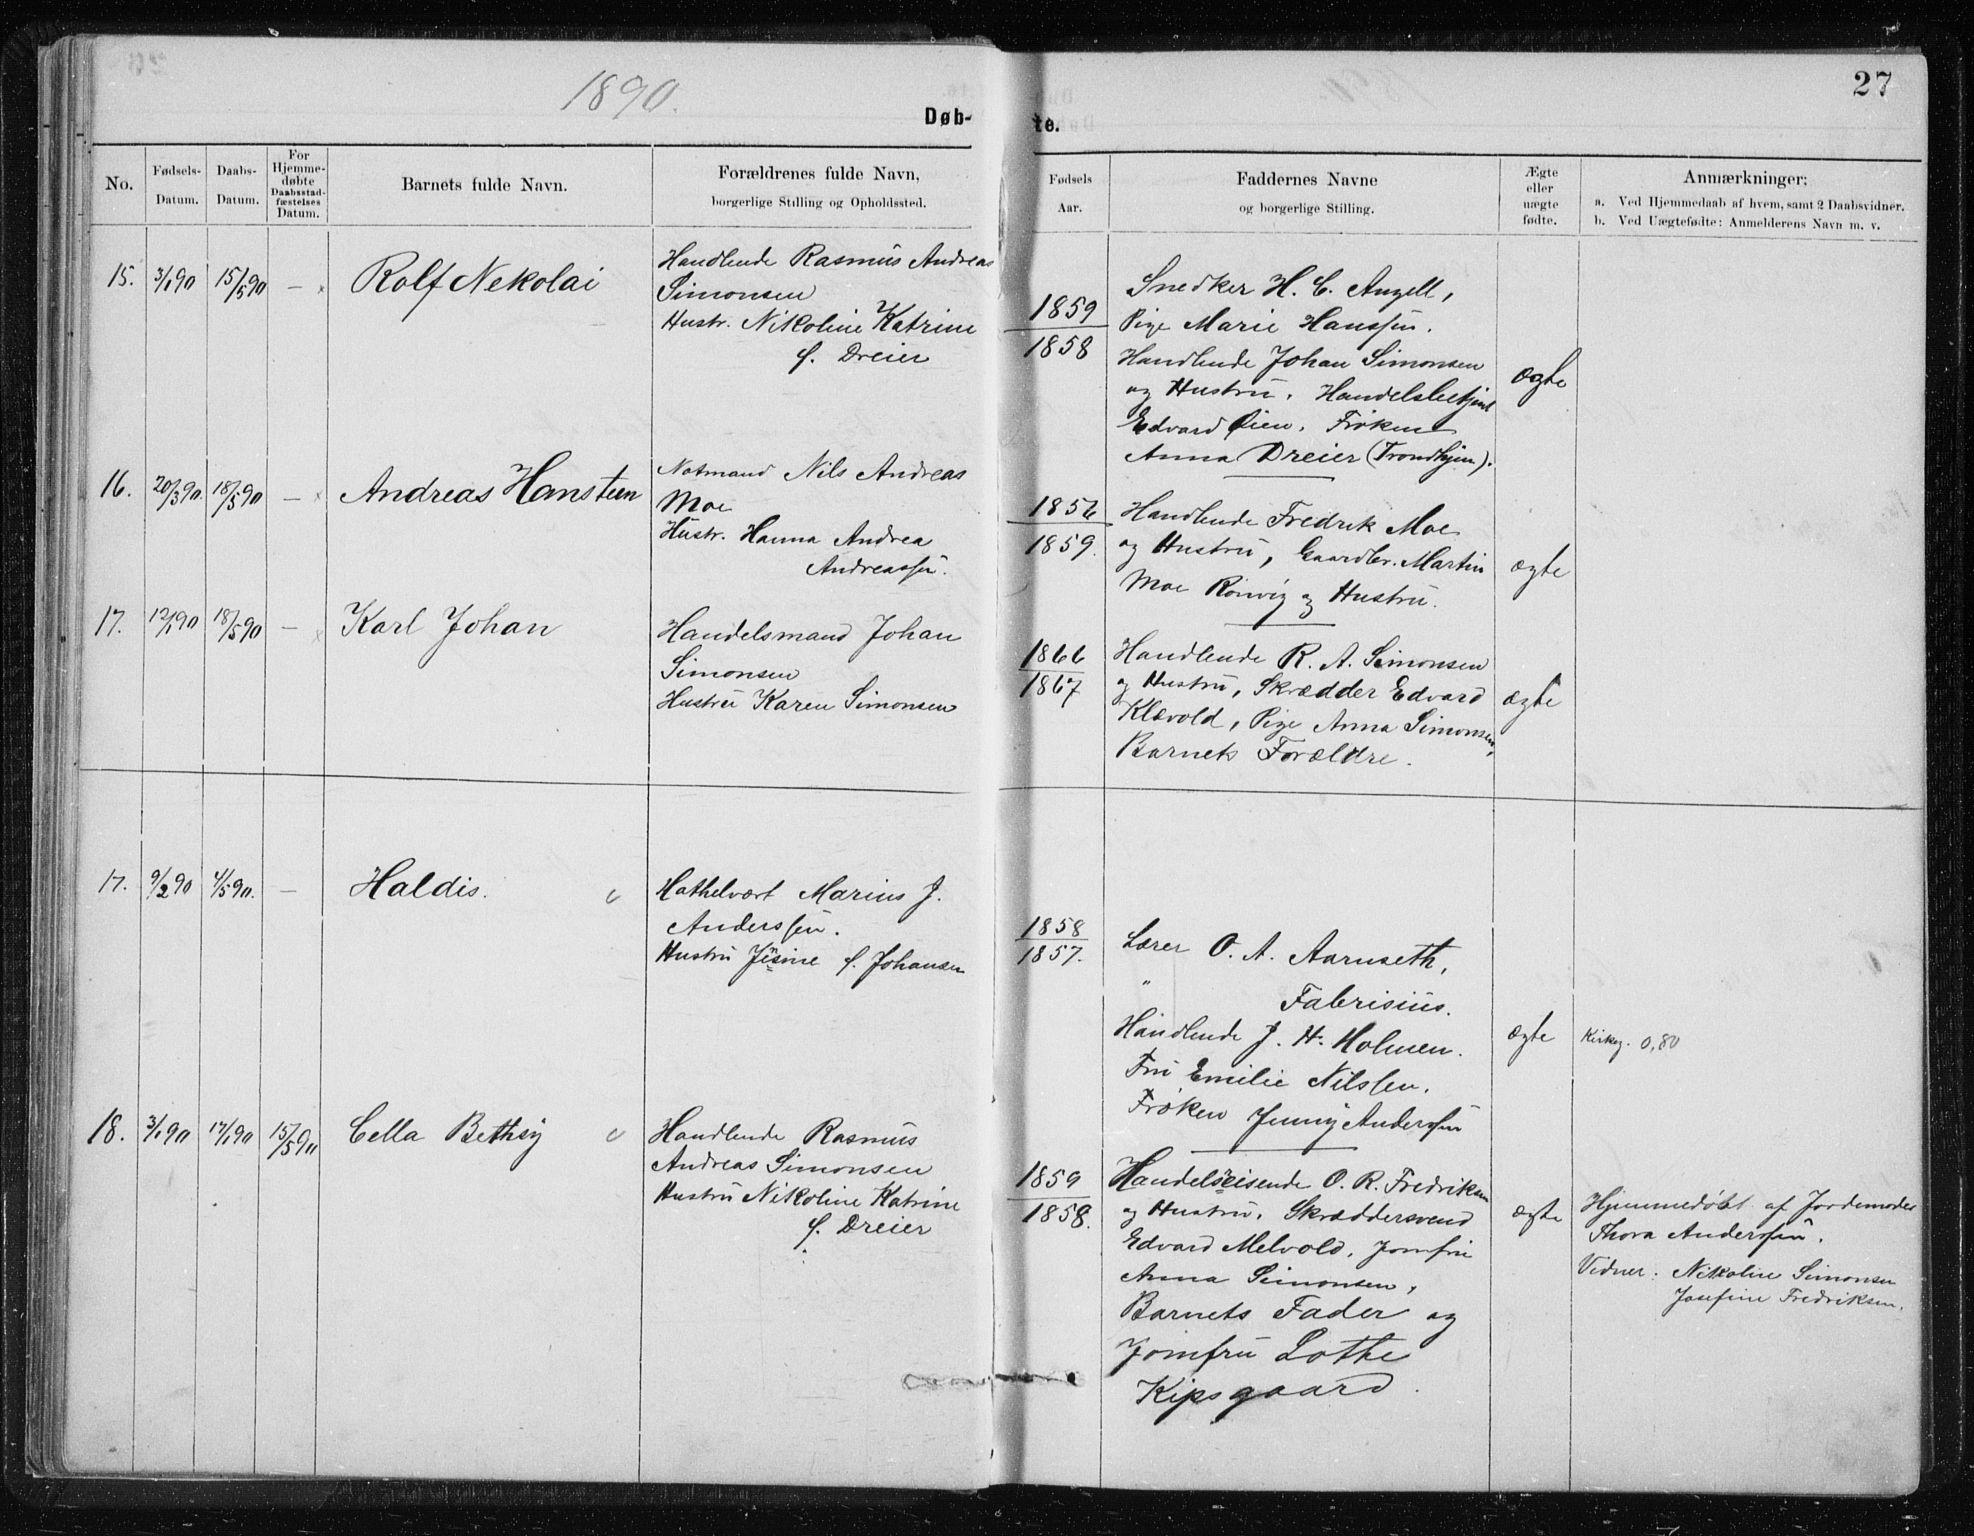 SAT, Ministerialprotokoller, klokkerbøker og fødselsregistre - Nordland, 801/L0032: Klokkerbok nr. 801C07, 1889-1897, s. 27